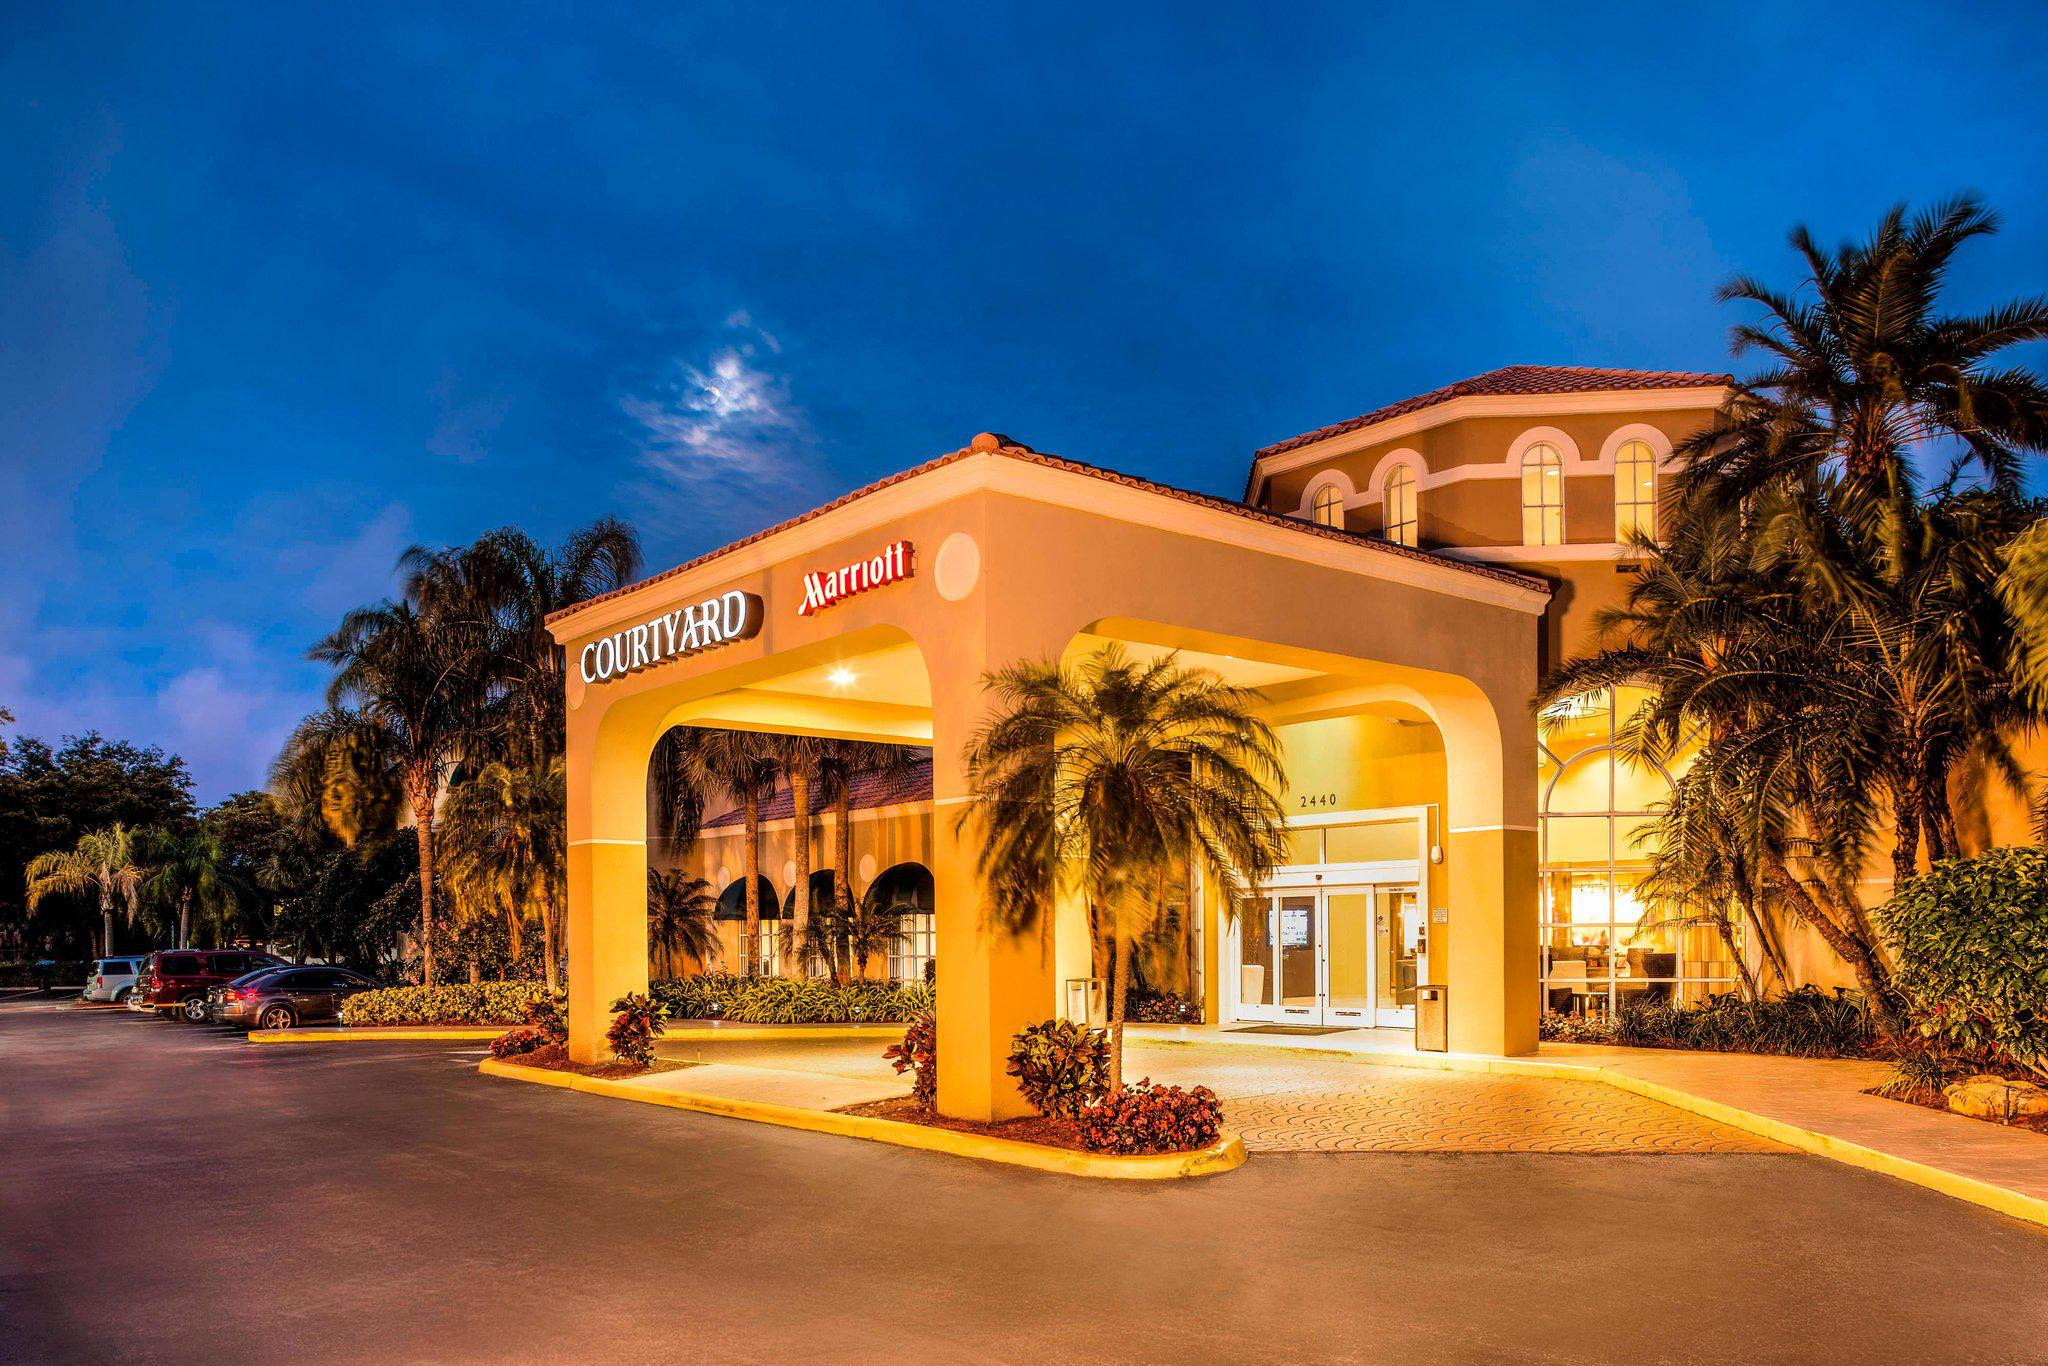 Courtyard by Marriott Fort Lauderdale North/Cypress Creek